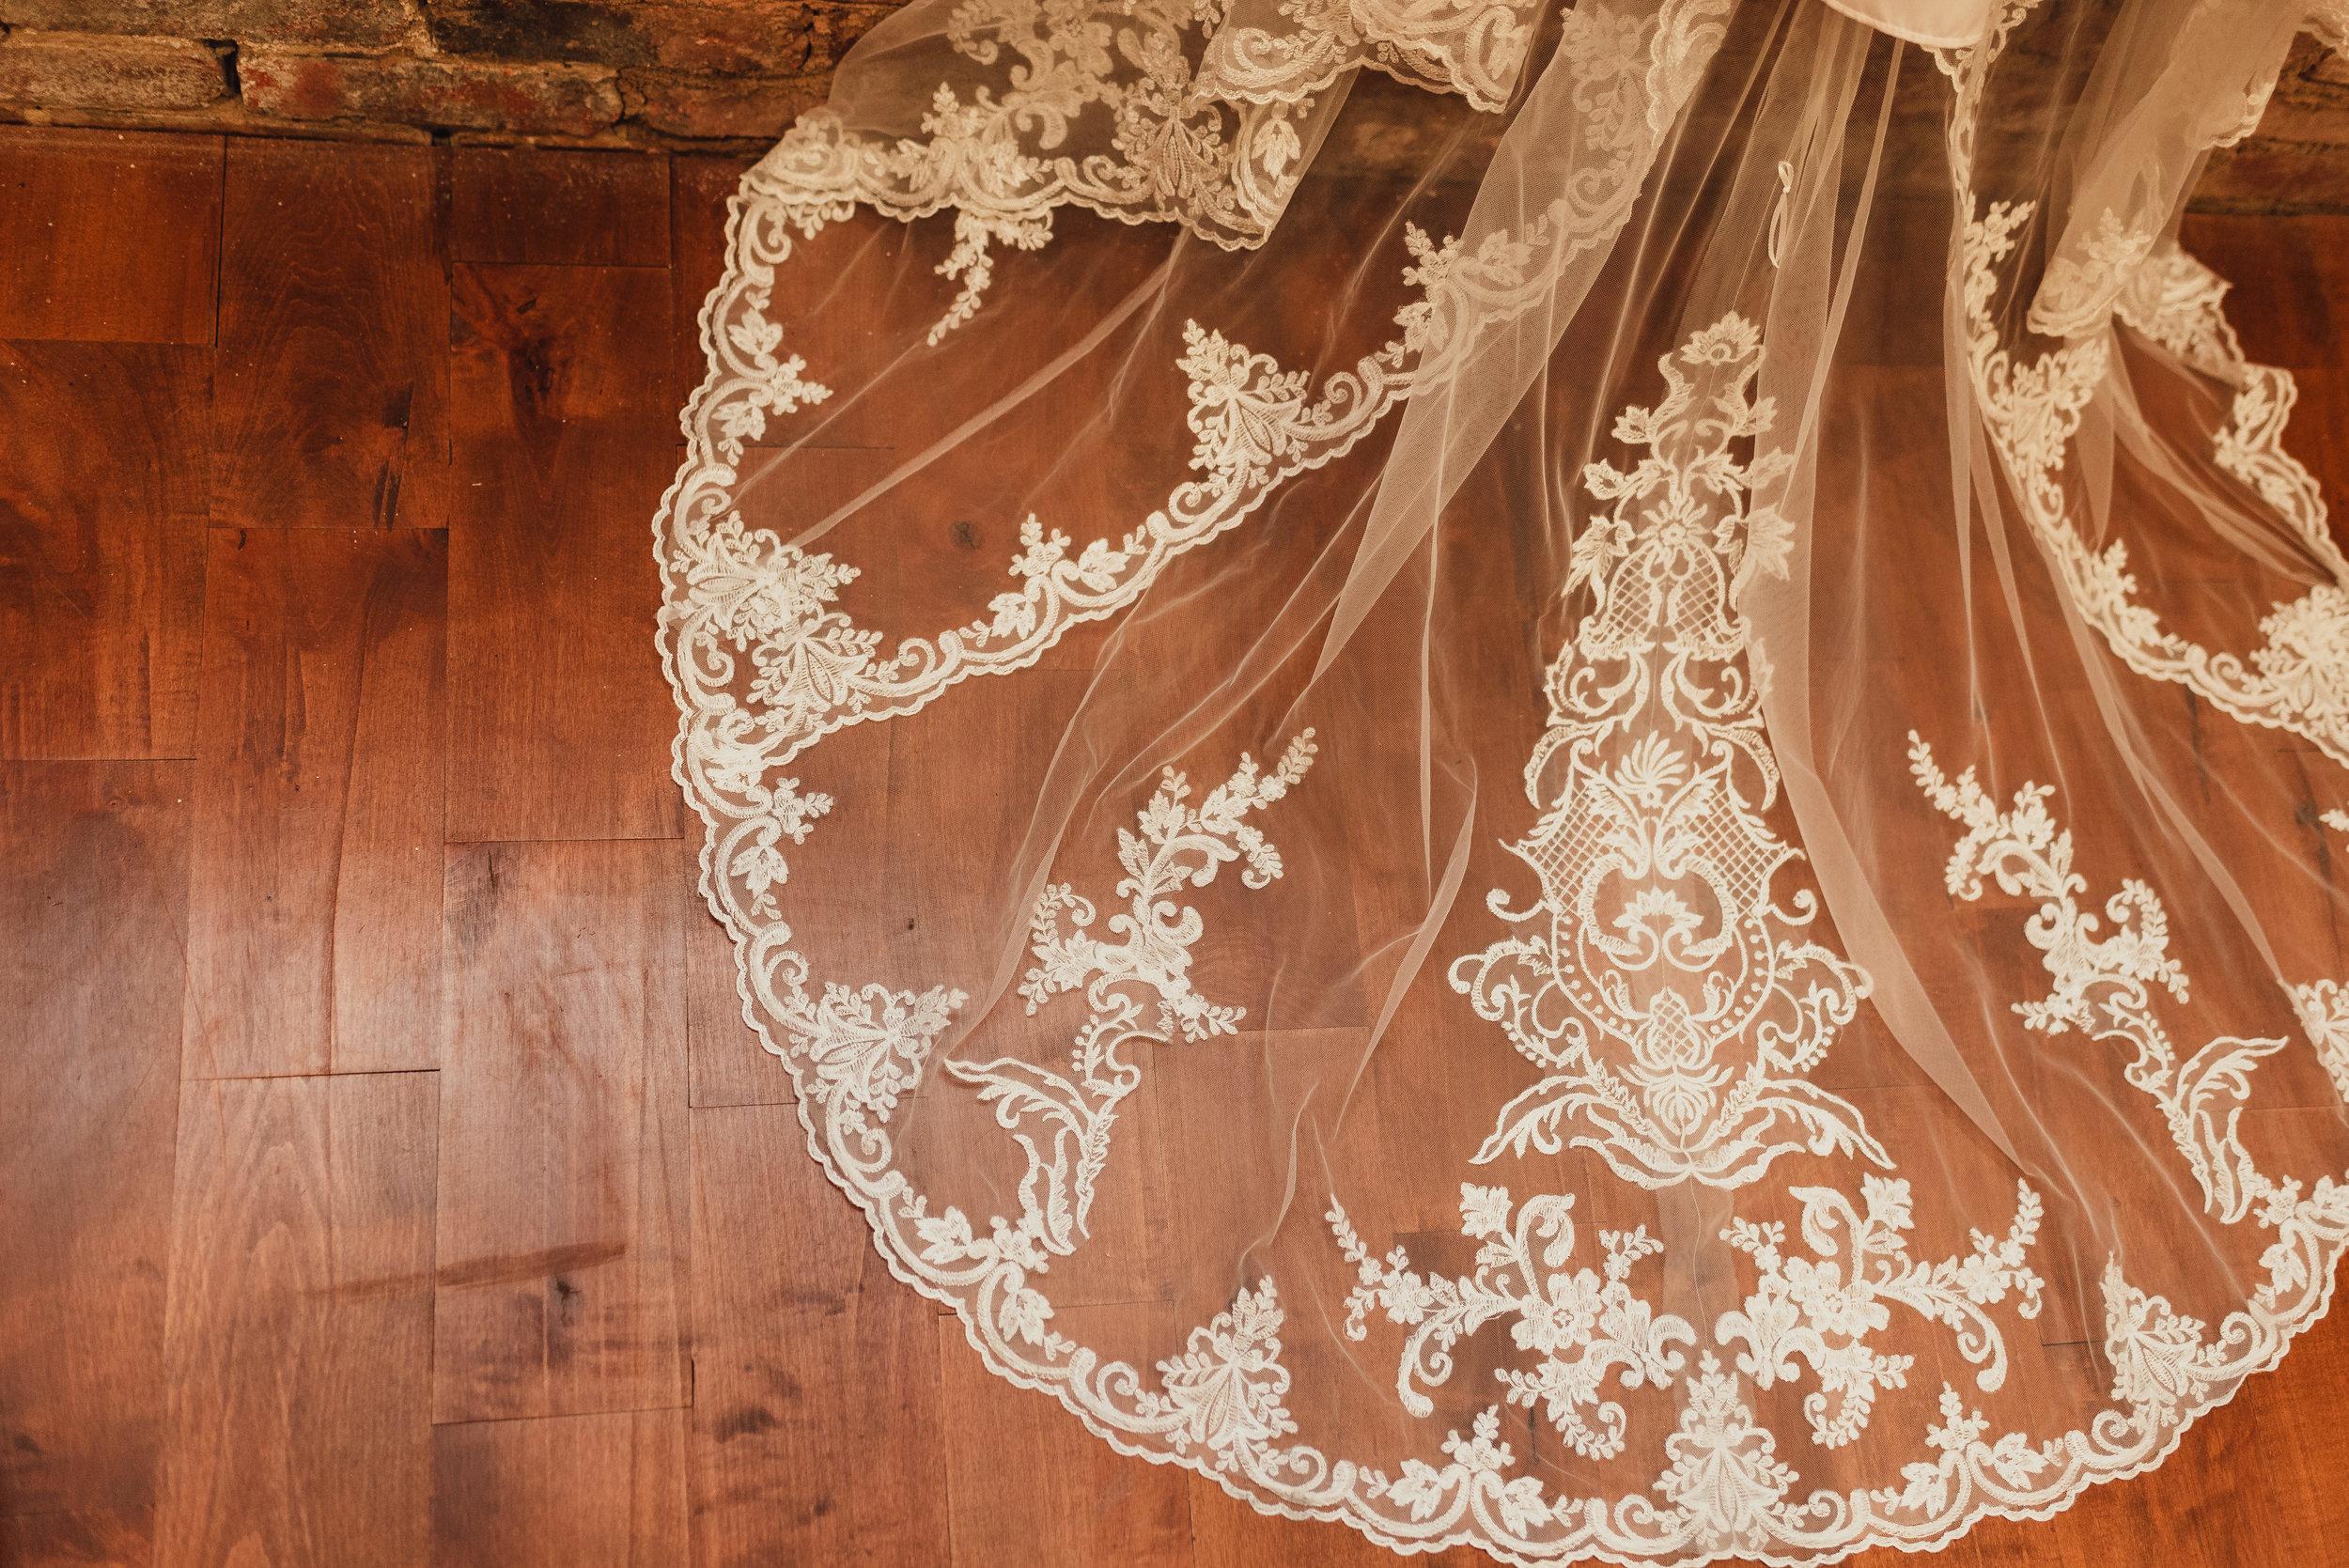 east-tn-wedding-photographer-tennessee-elopement-photographer-kingsport-tn-wedding-photographer (37 of 1001).jpg